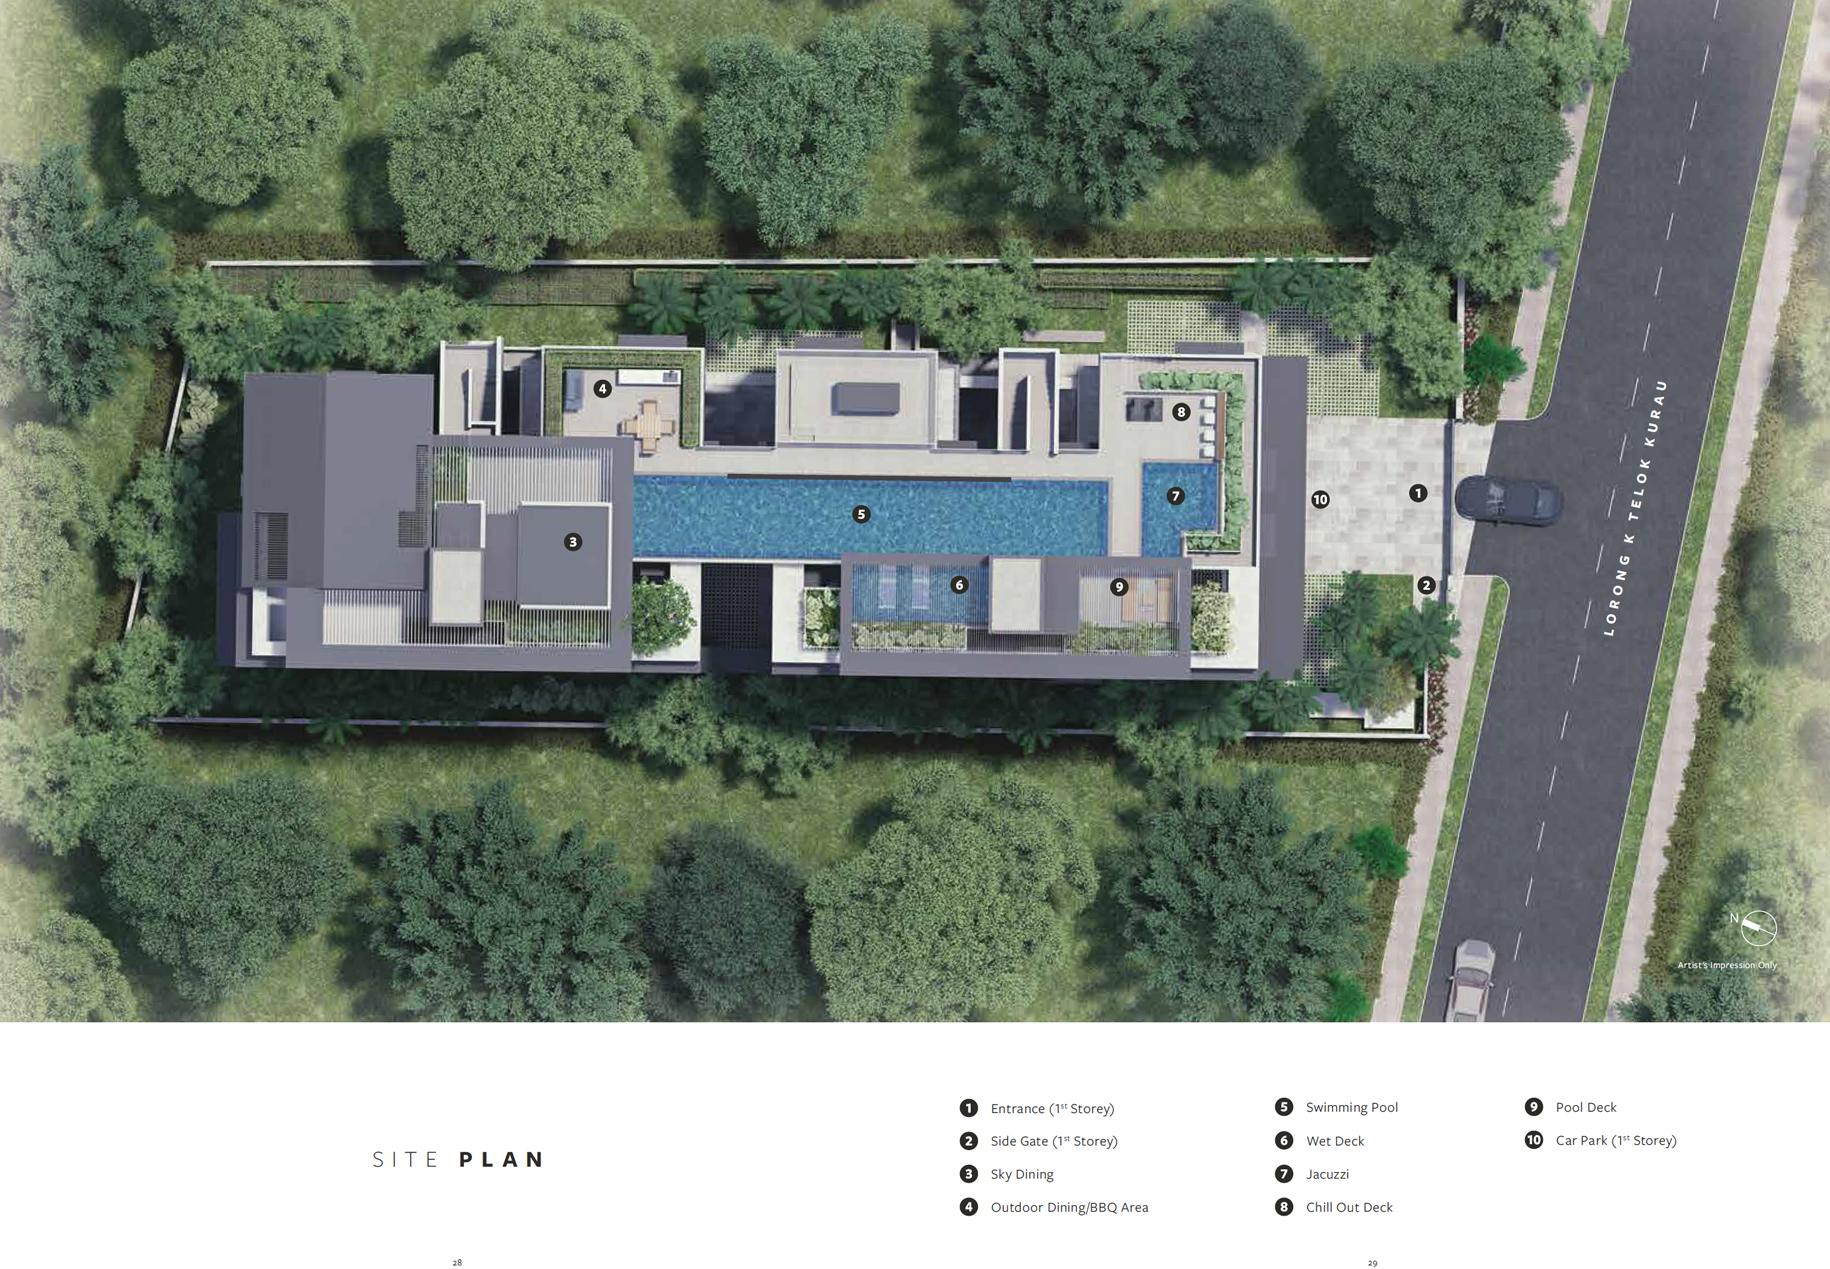 fivenine site plan